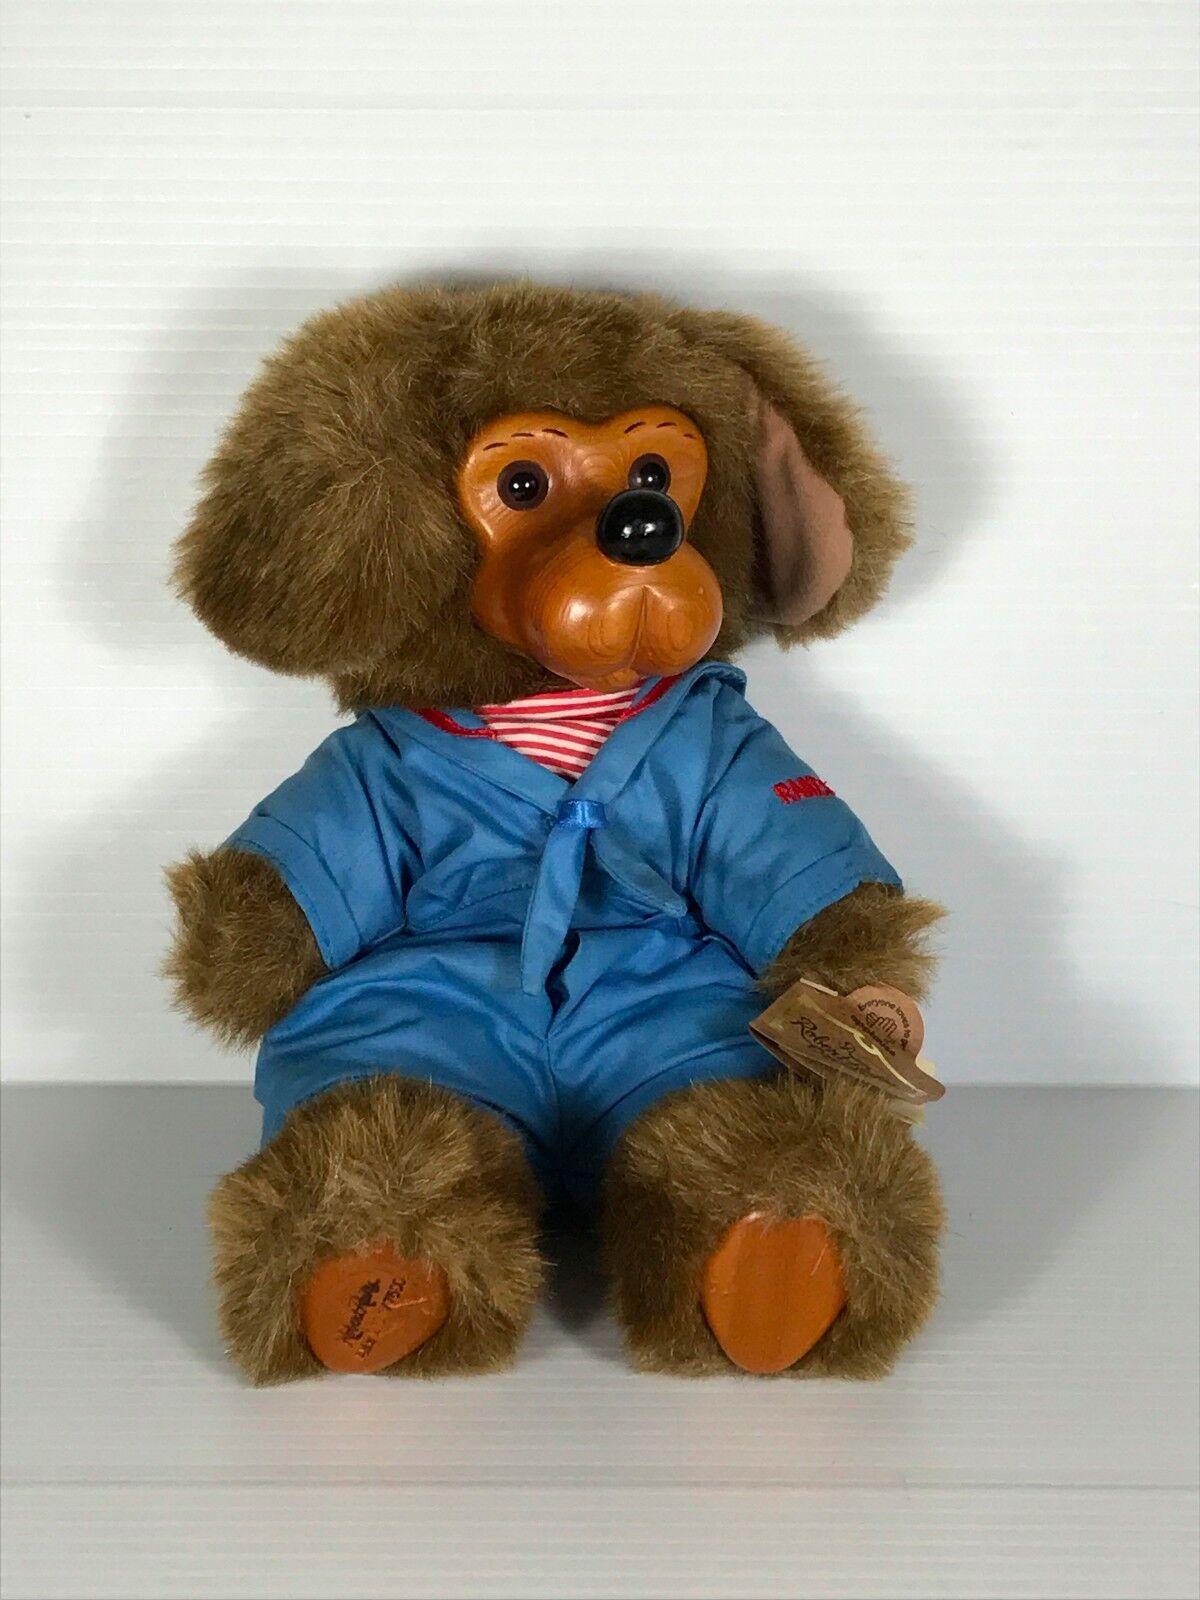 ROBERT RAIKES ORIGINAL BEAR, carved wood bear, Applause bear, sailor bear, NWT